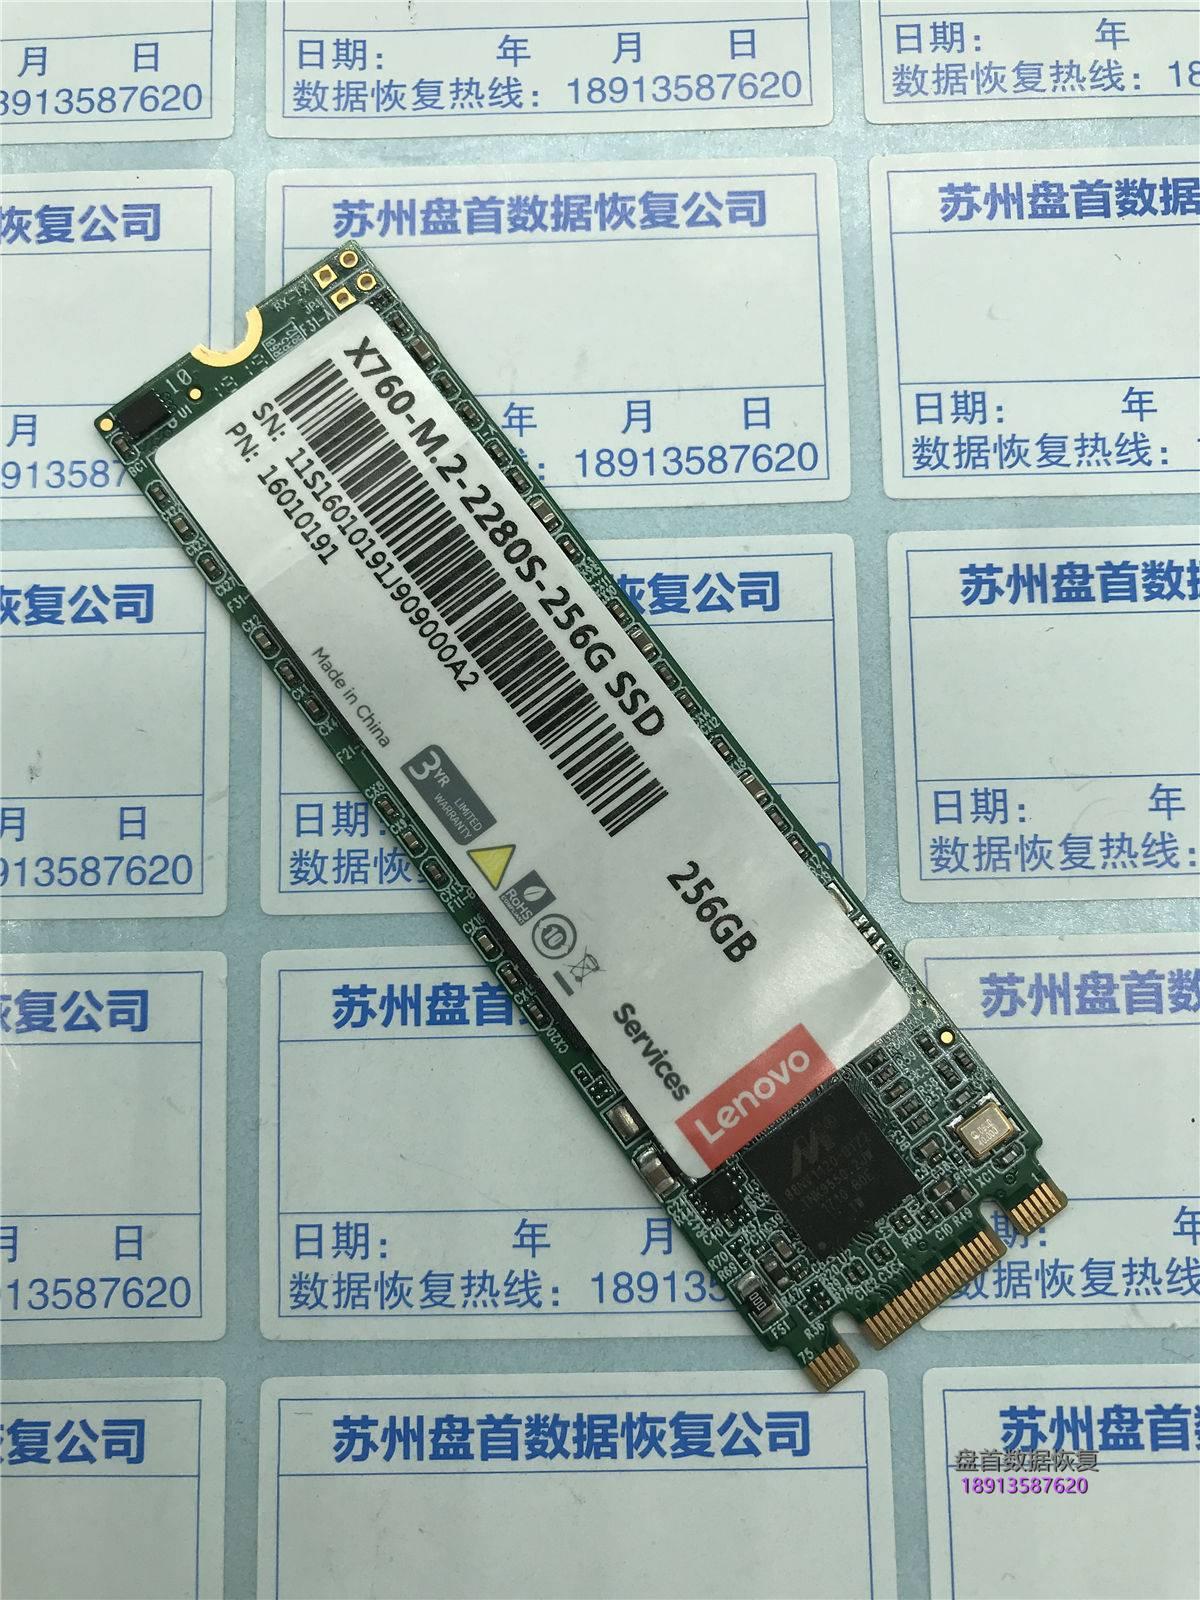 0-3 Lenovo X760固态硬盘Marvell 88NV1120主控无法识别二次恢复成功